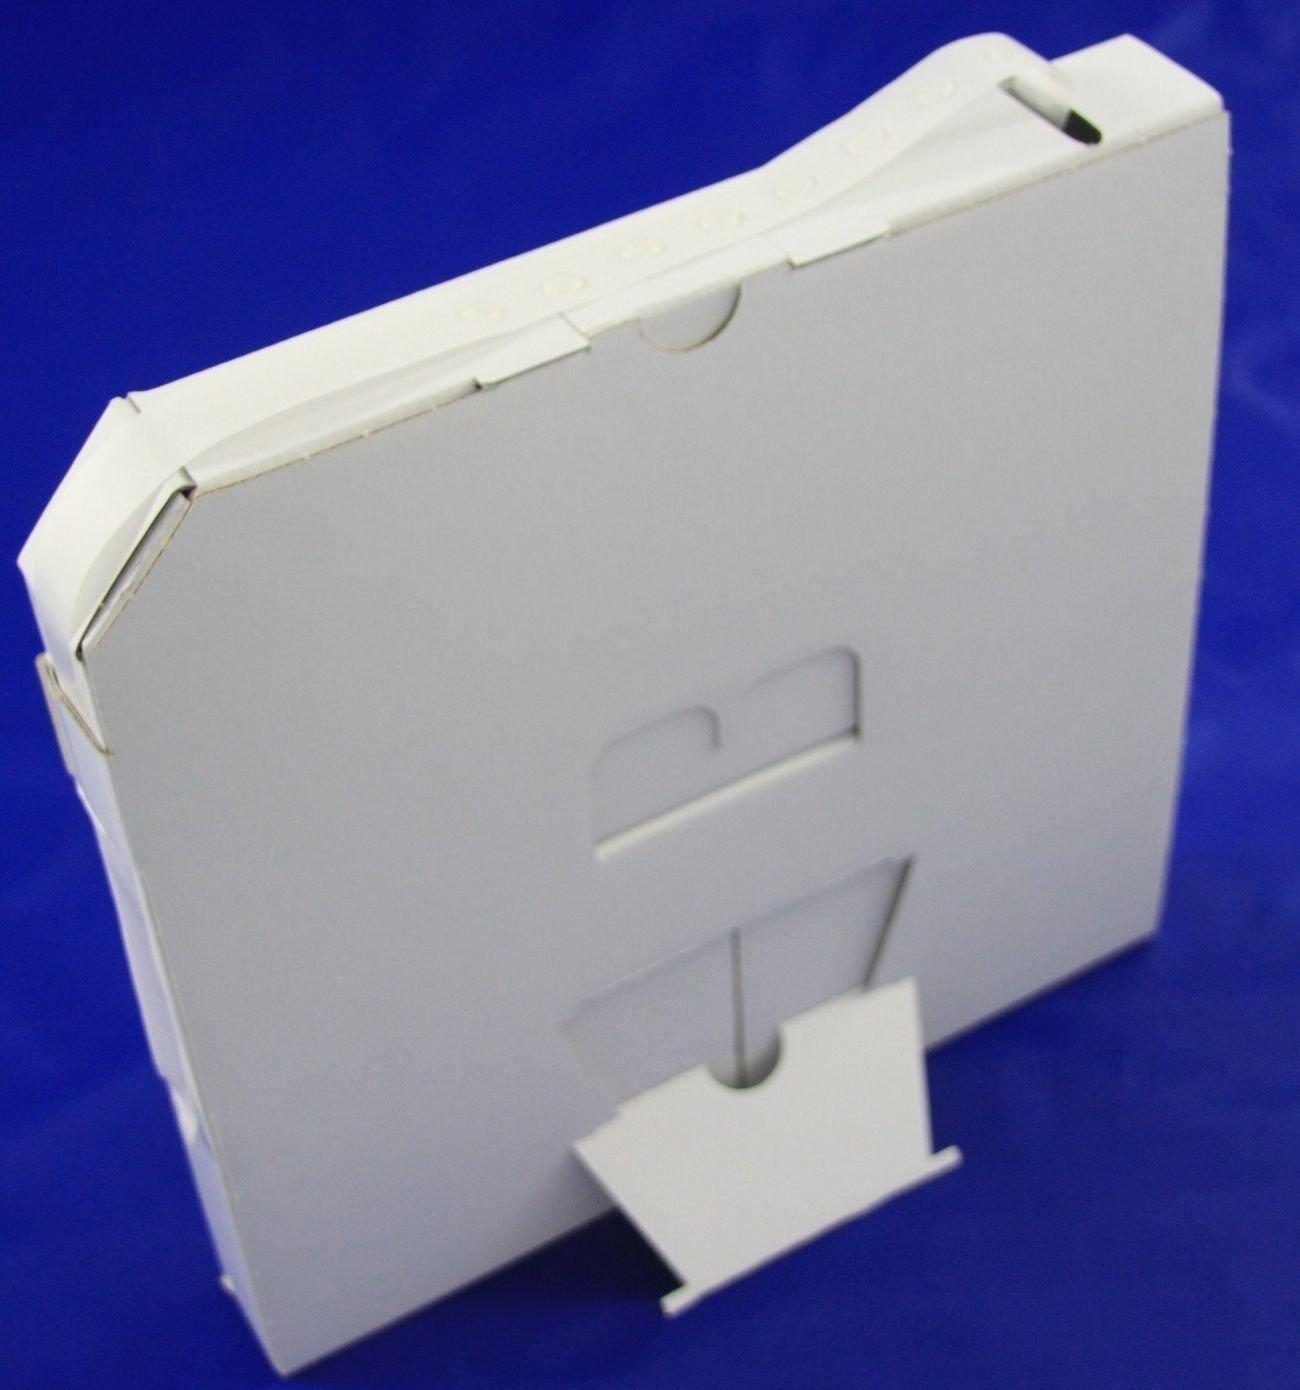 5000 Glue Dots Sticky Craft Clear Card Making Scrap Removable 6mm HIGH TACK GLU DOTS